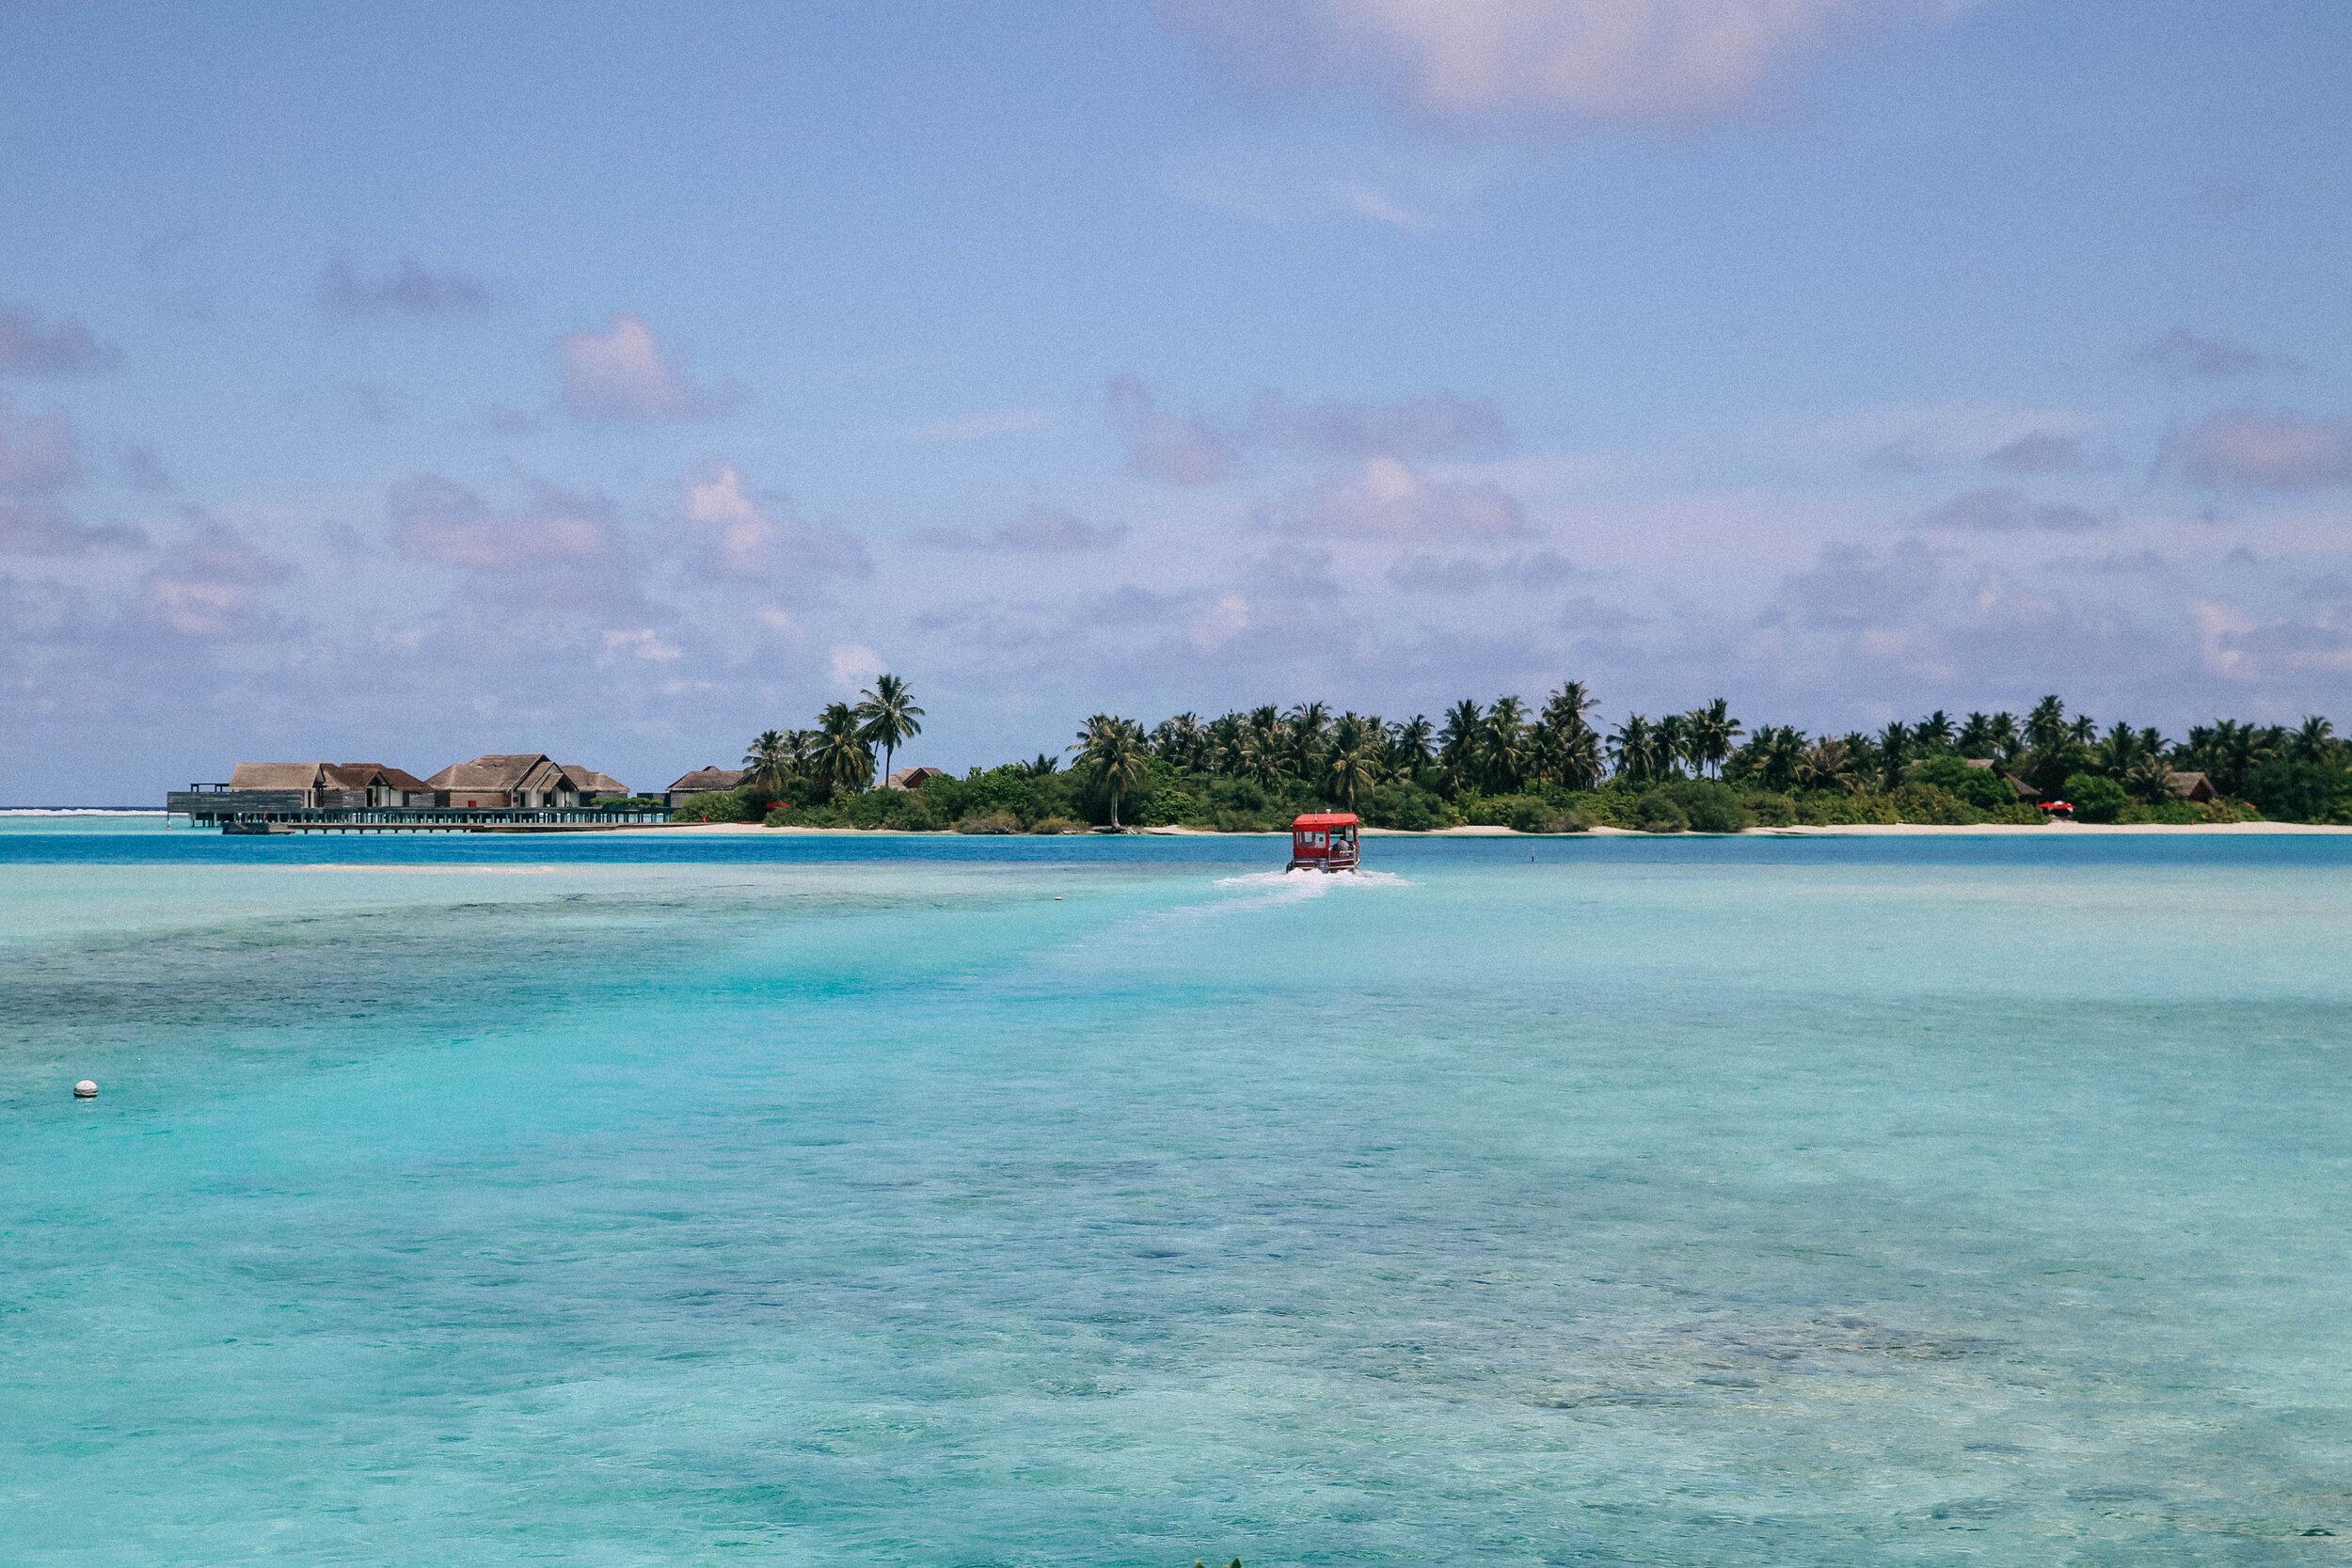 Fitness retreats in Maldives, niyama maldives